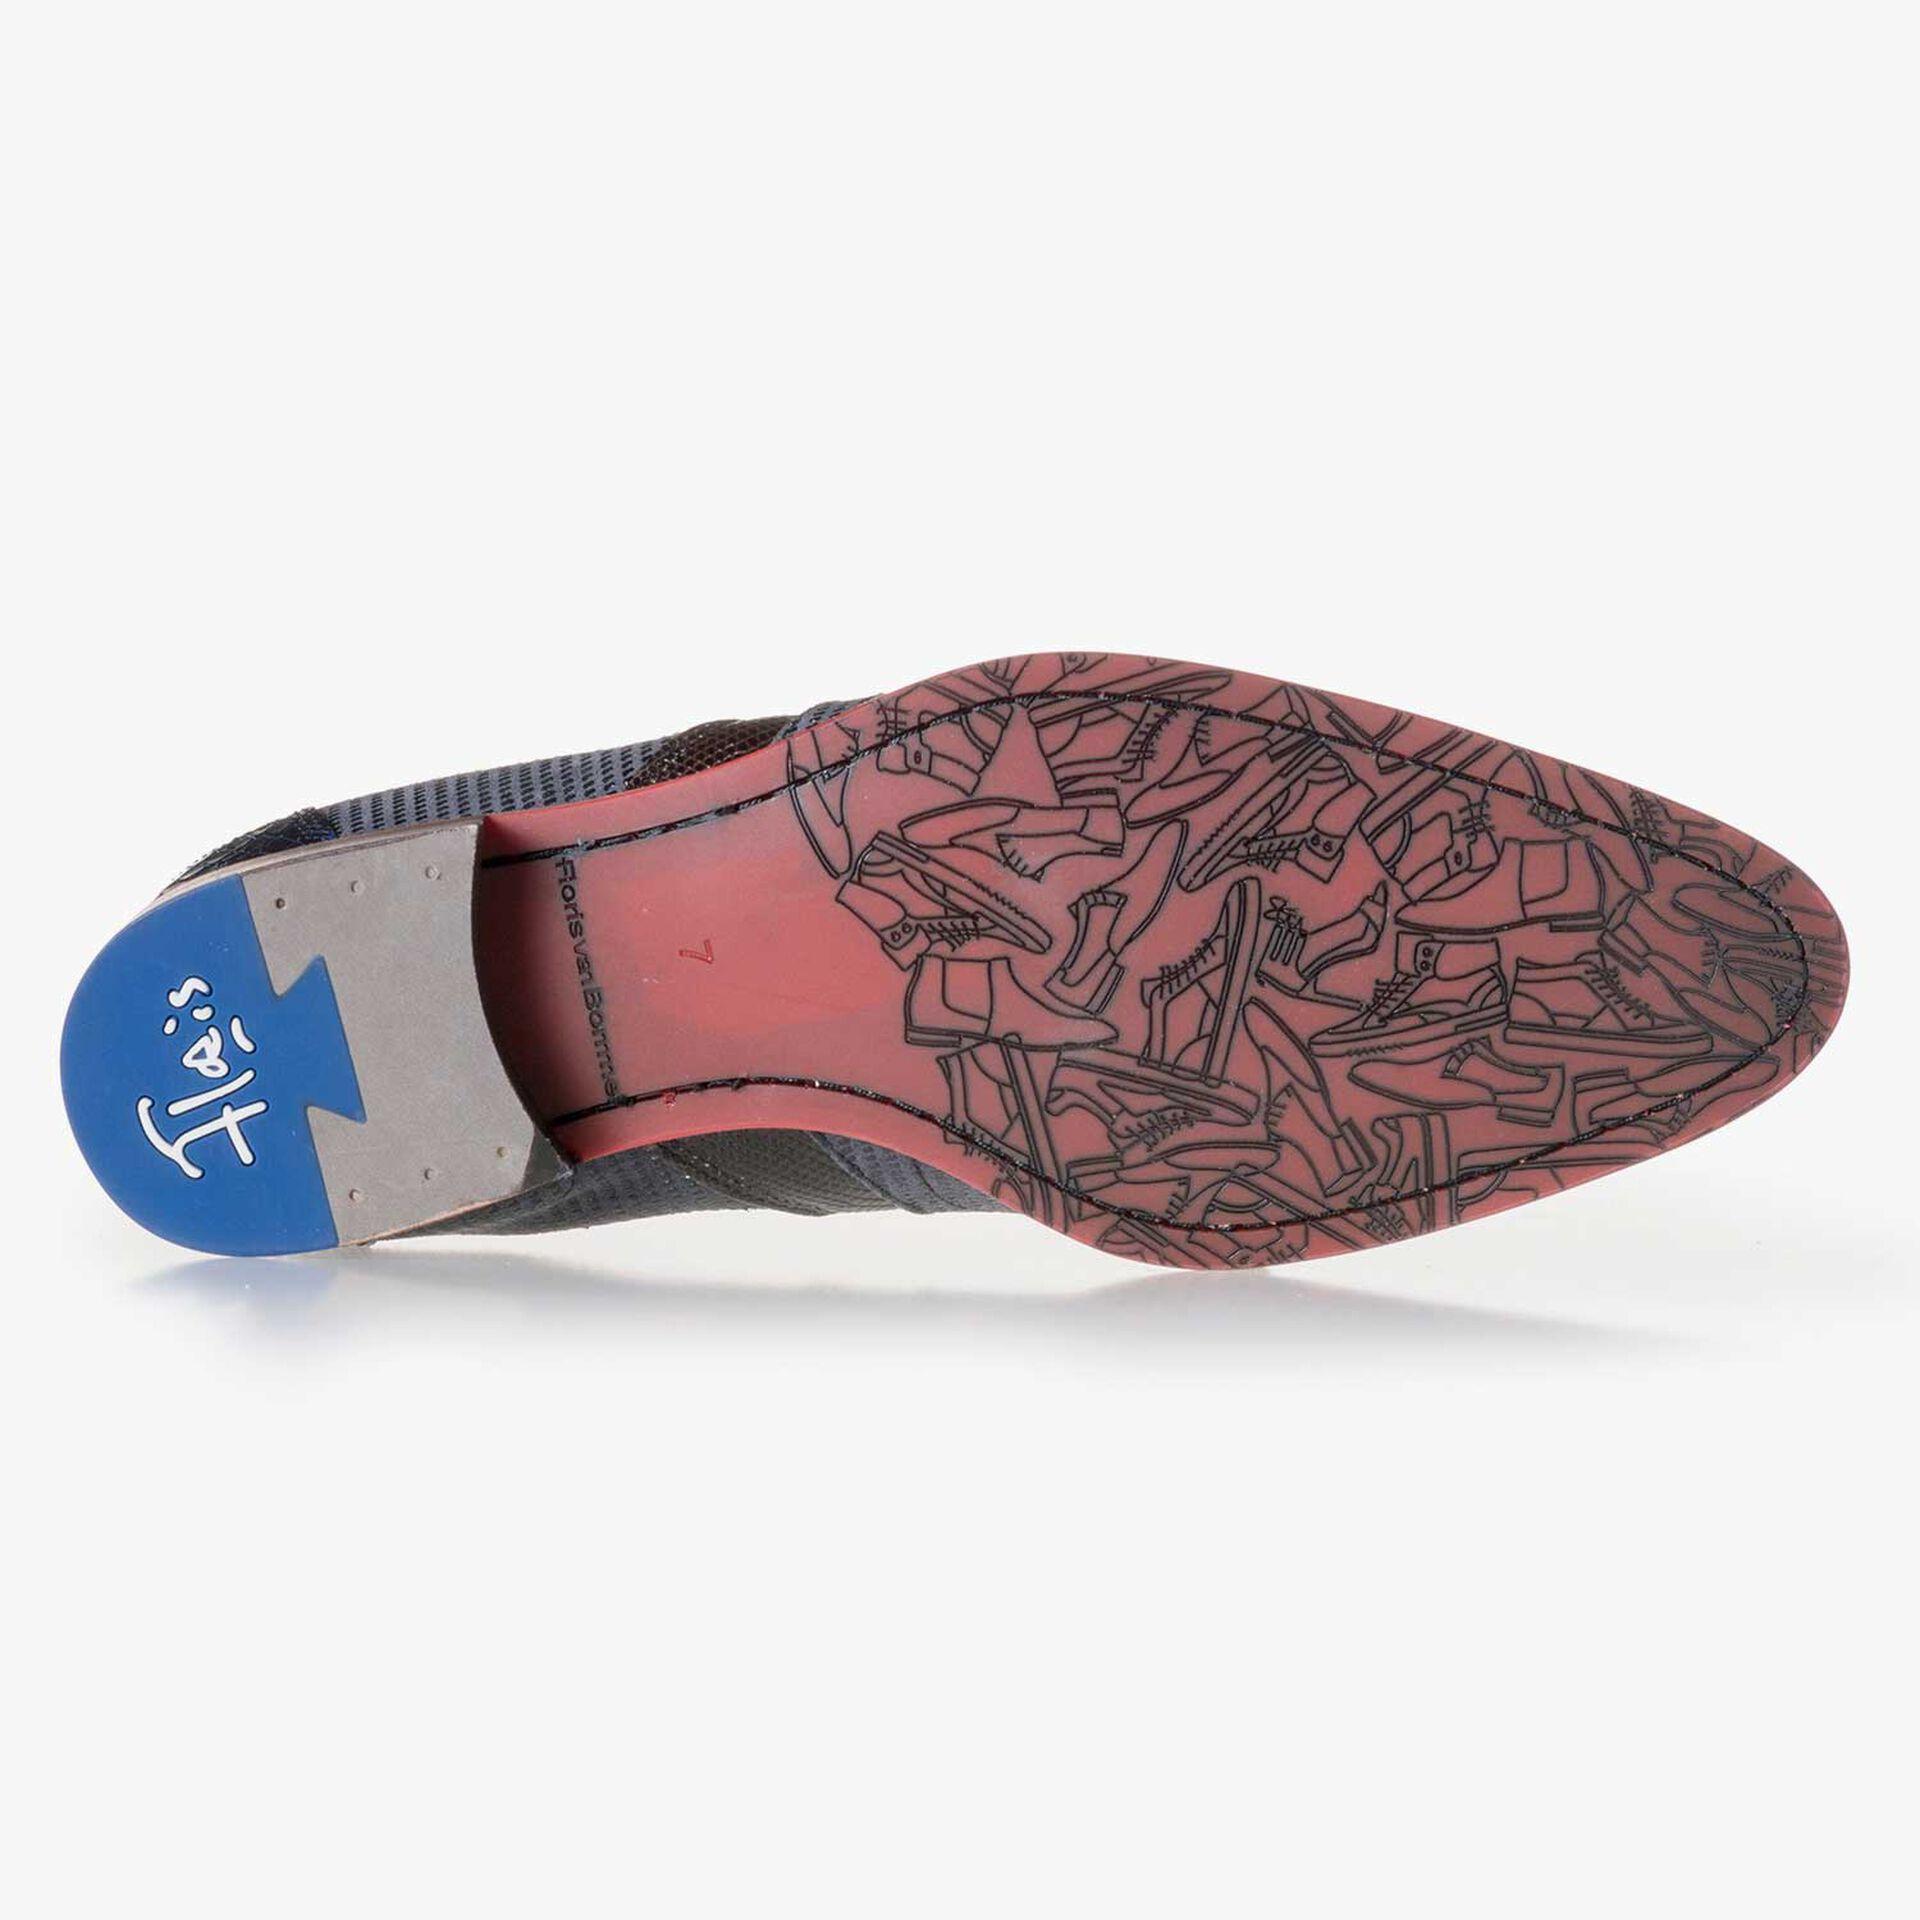 Dark grey suede leather Chelsea boot